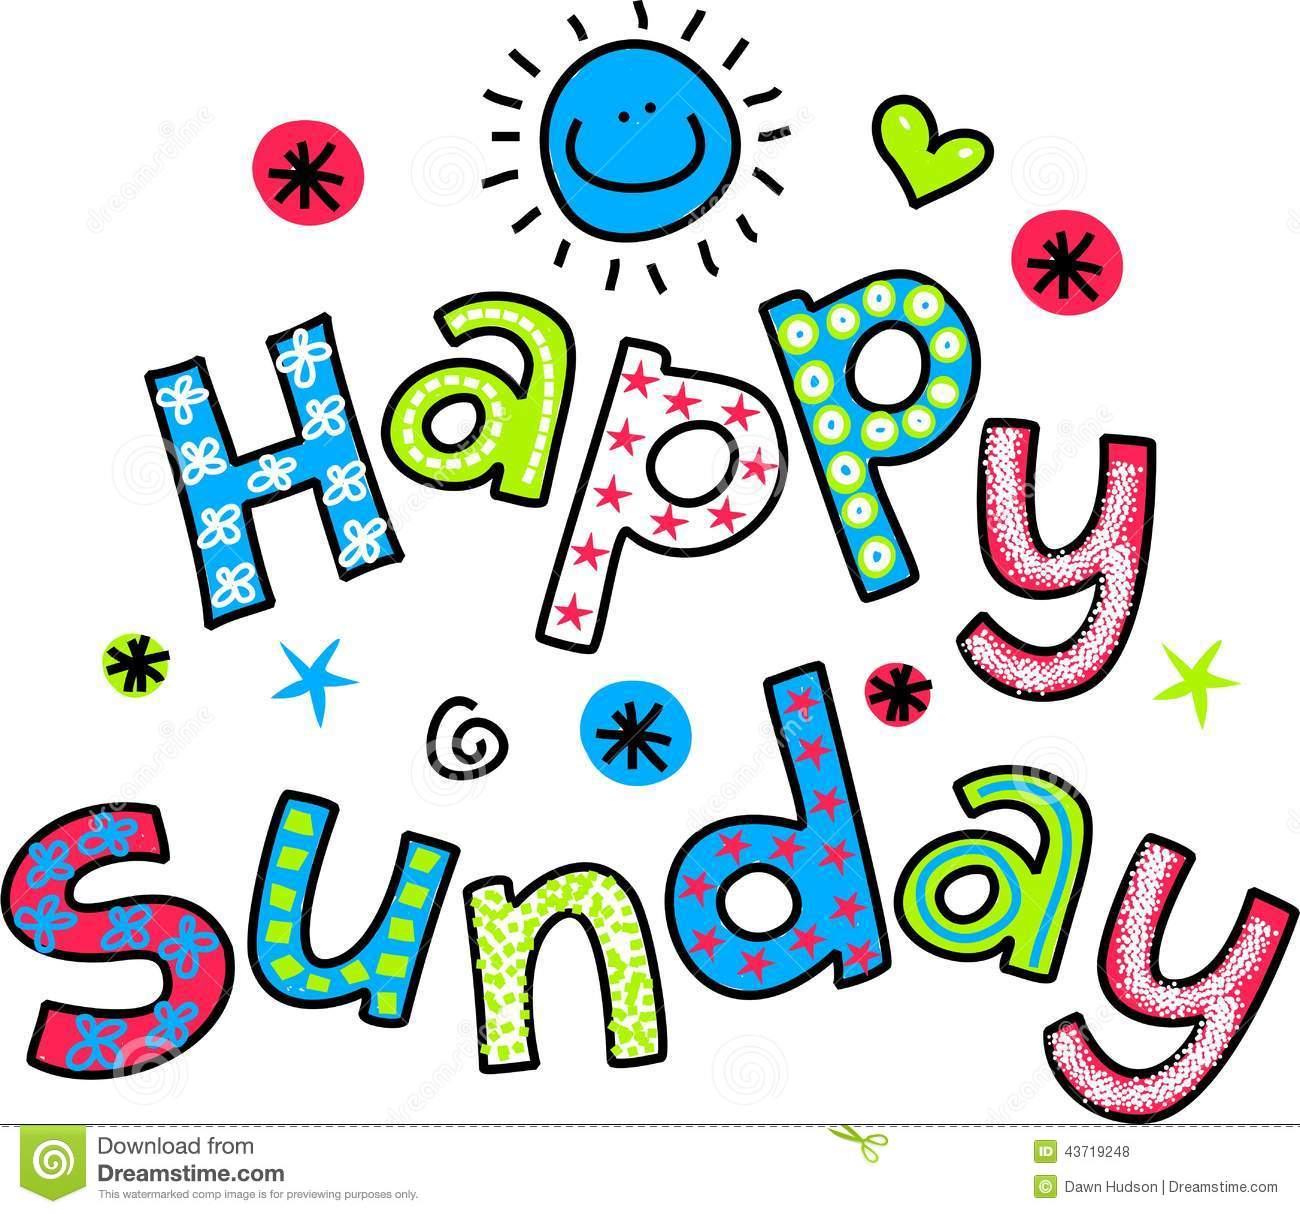 good morning sunday clipart #17